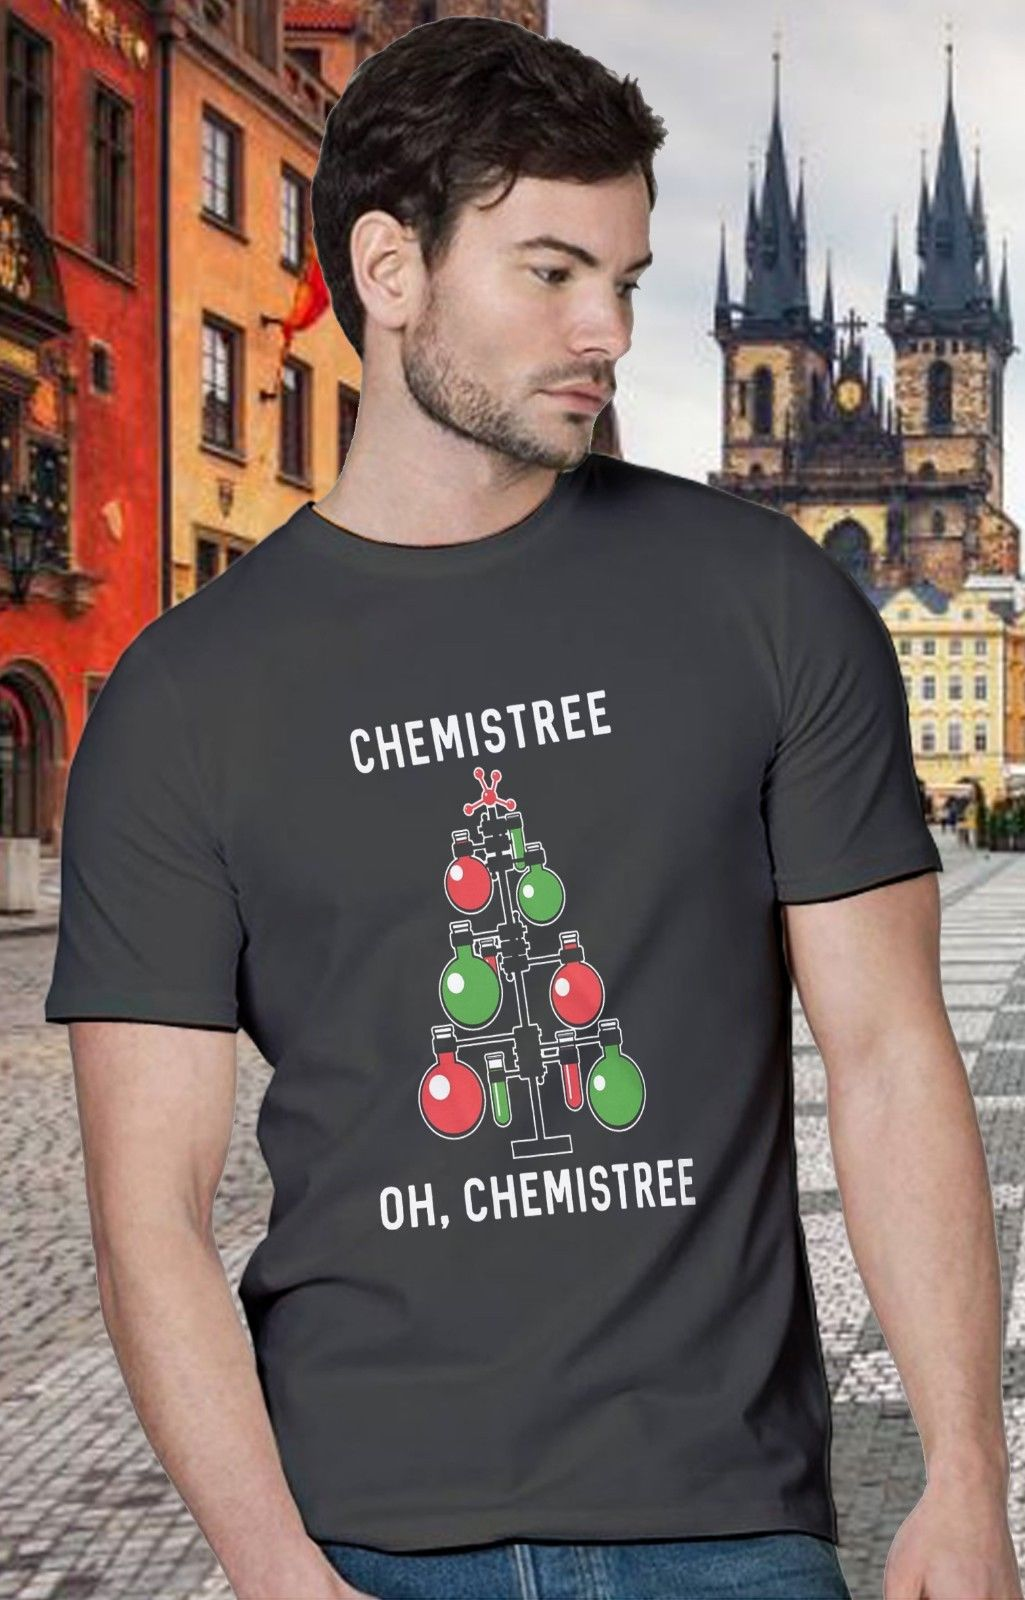 Chemistree Tshirt Funny Chemistry Science Christmas Tee Unisex Logo Gift New